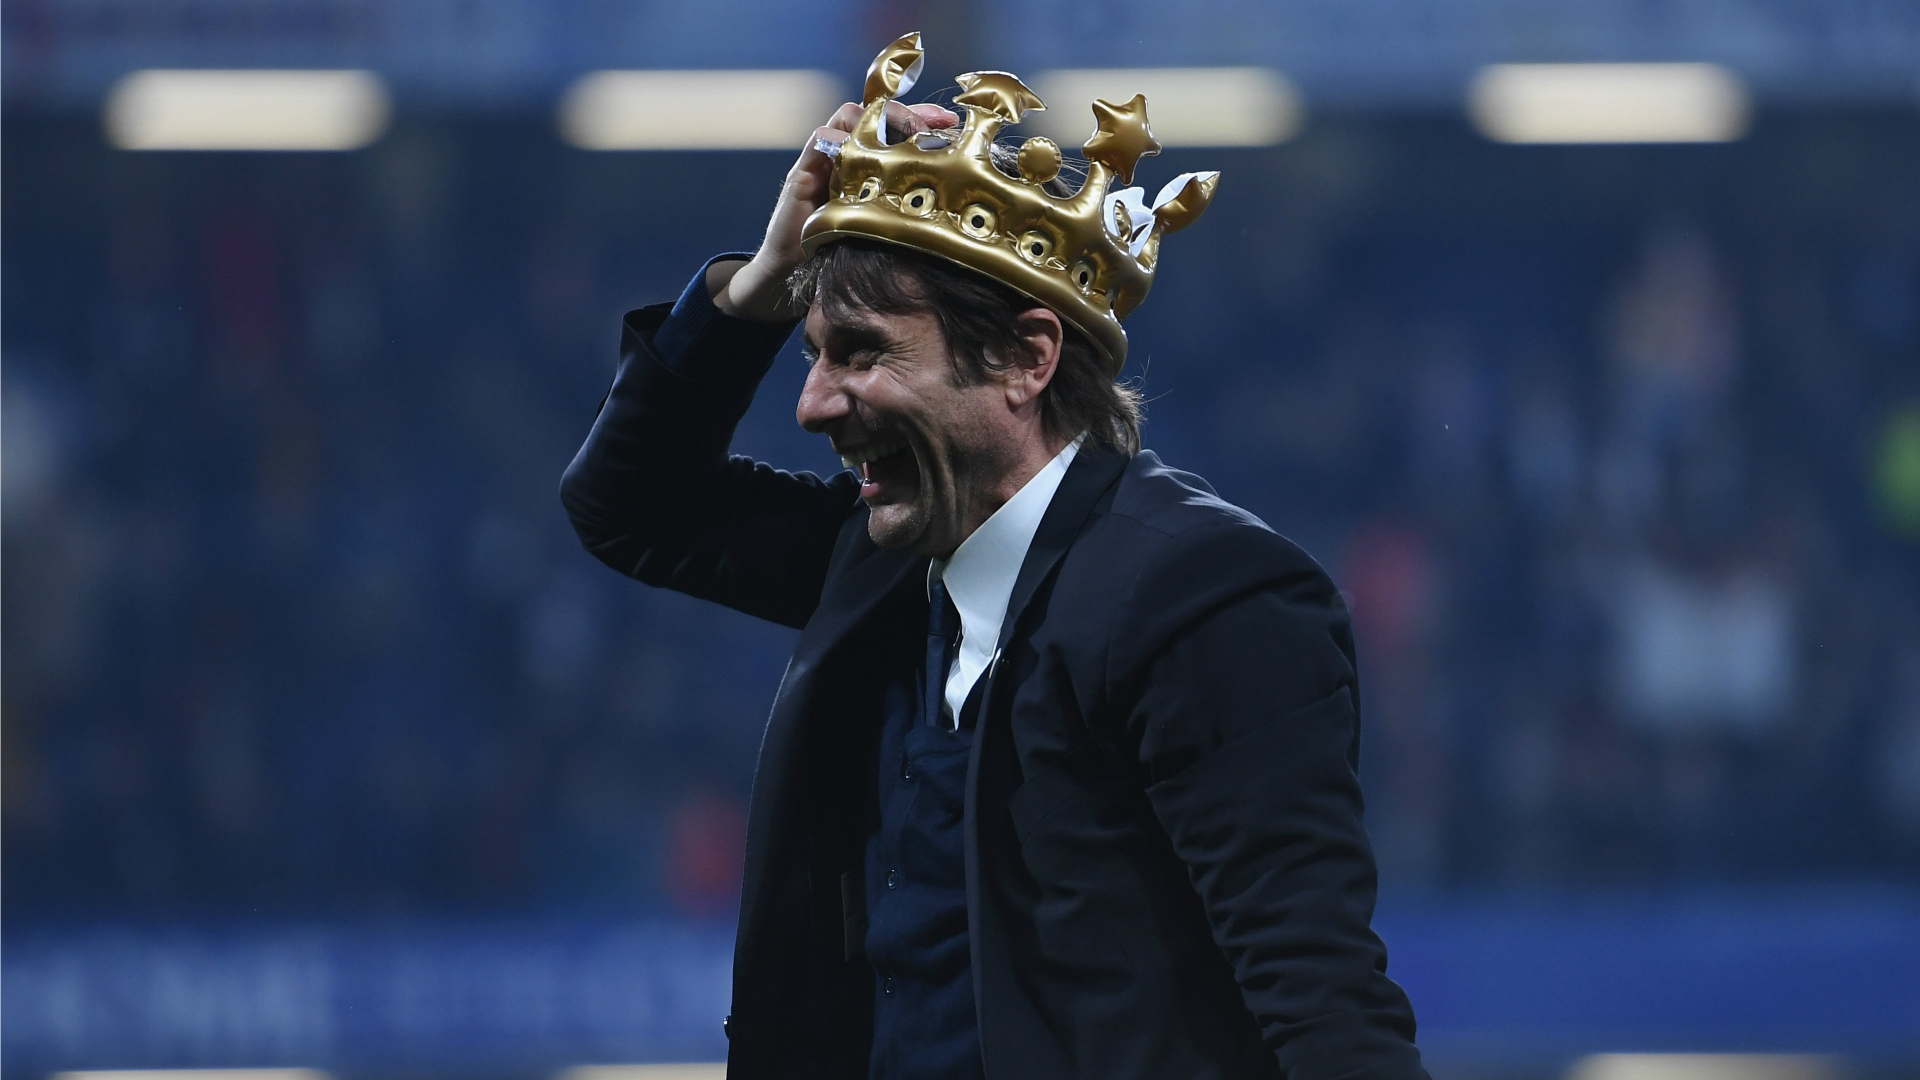 Conte d'Inghilterra regala la Premier al Chelsea